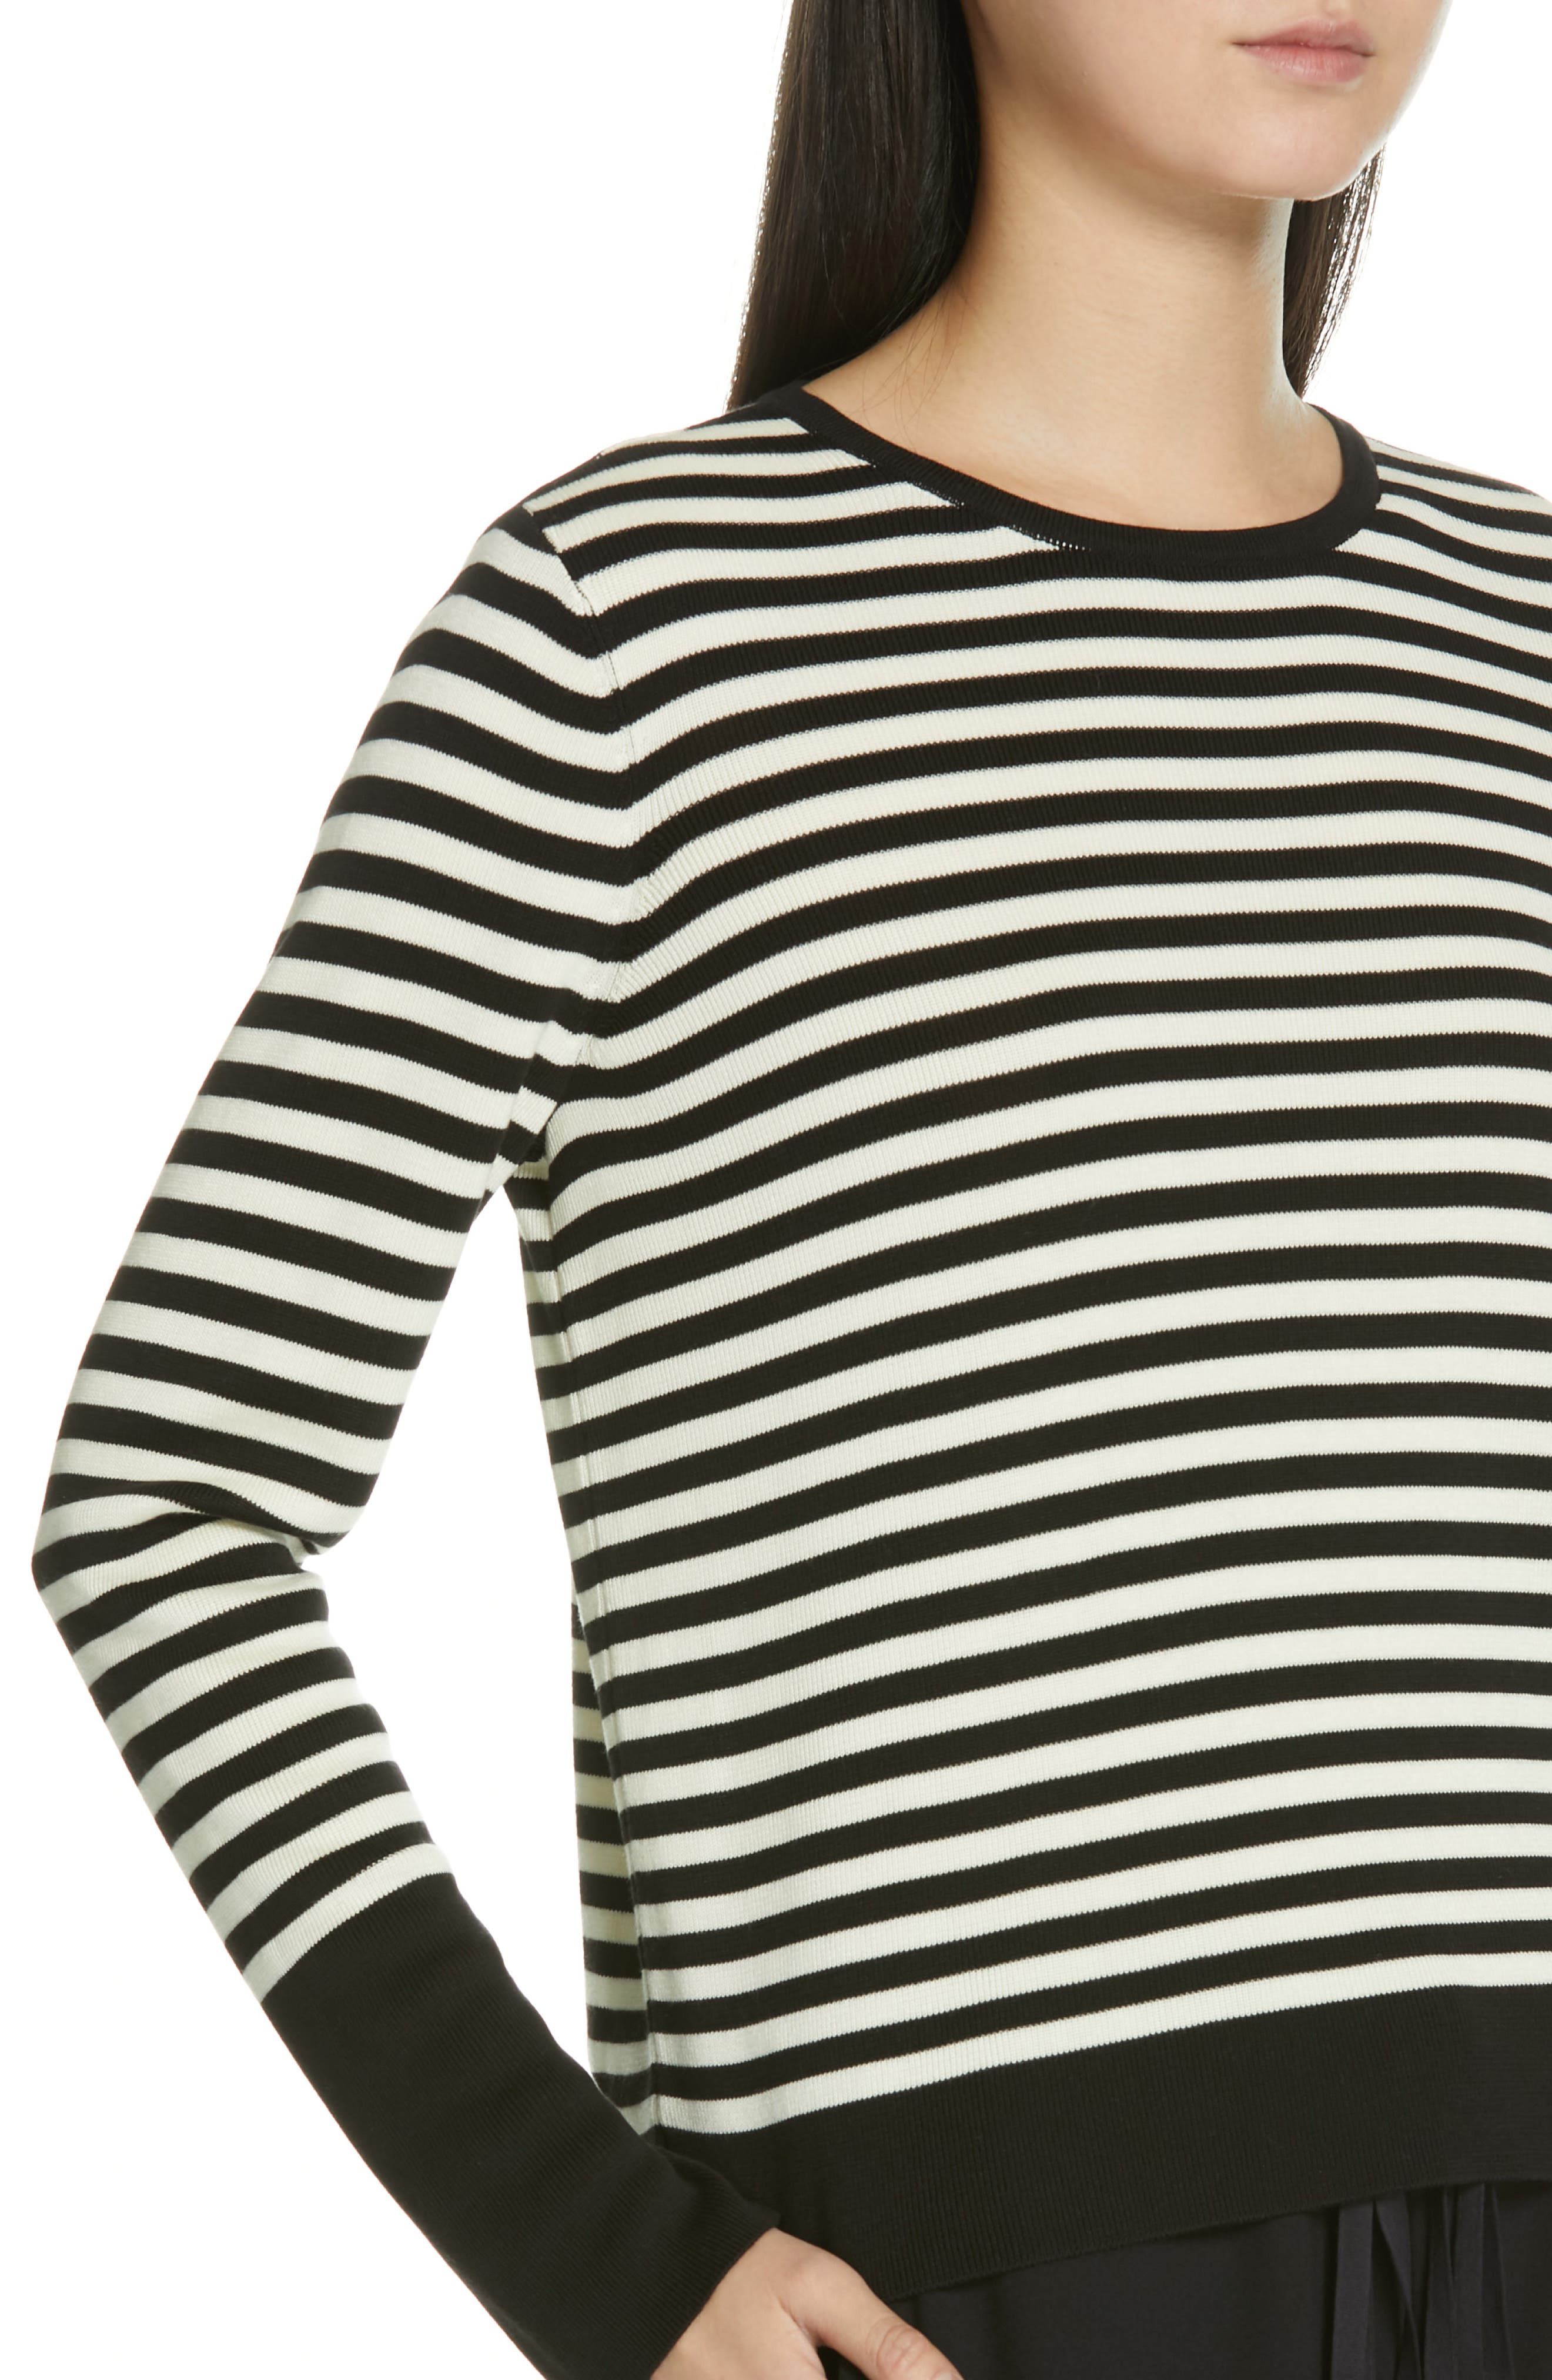 Tencel<sup>®</sup> Lyocell & Silk Sweater,                             Alternate thumbnail 4, color,                             BLACK/ SOFT WHITE